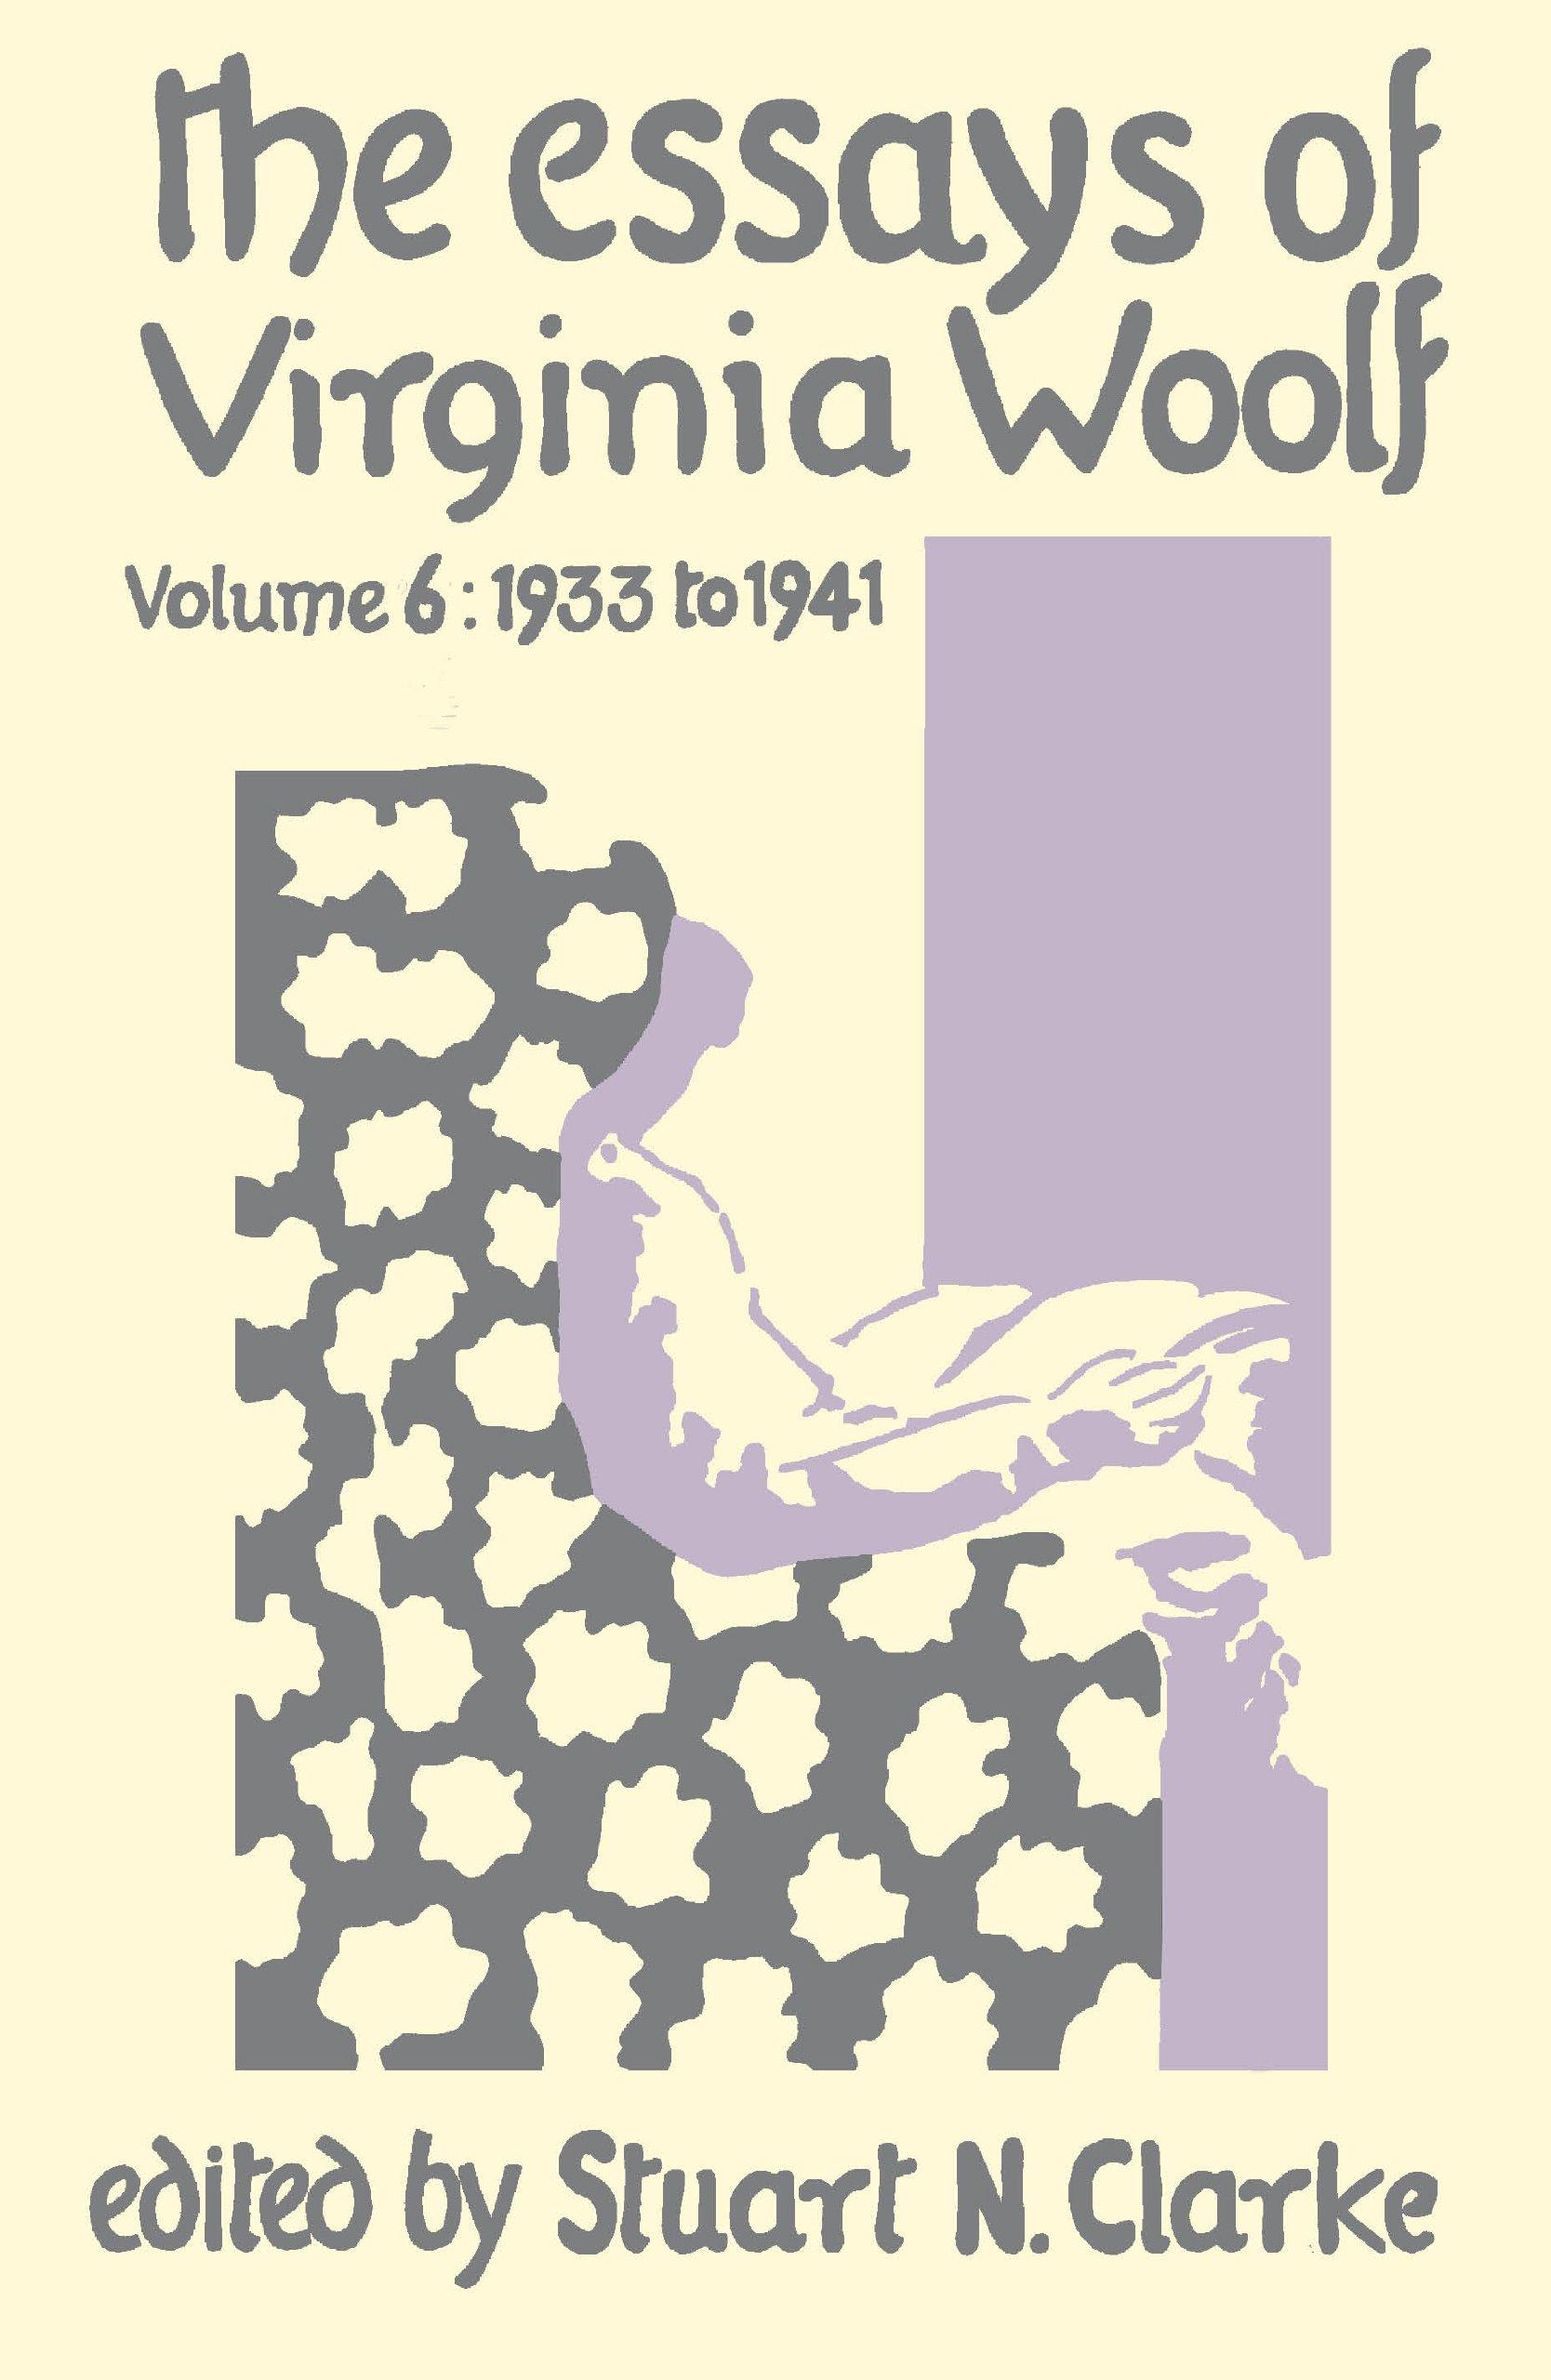 essays of virginia woolf vol 6